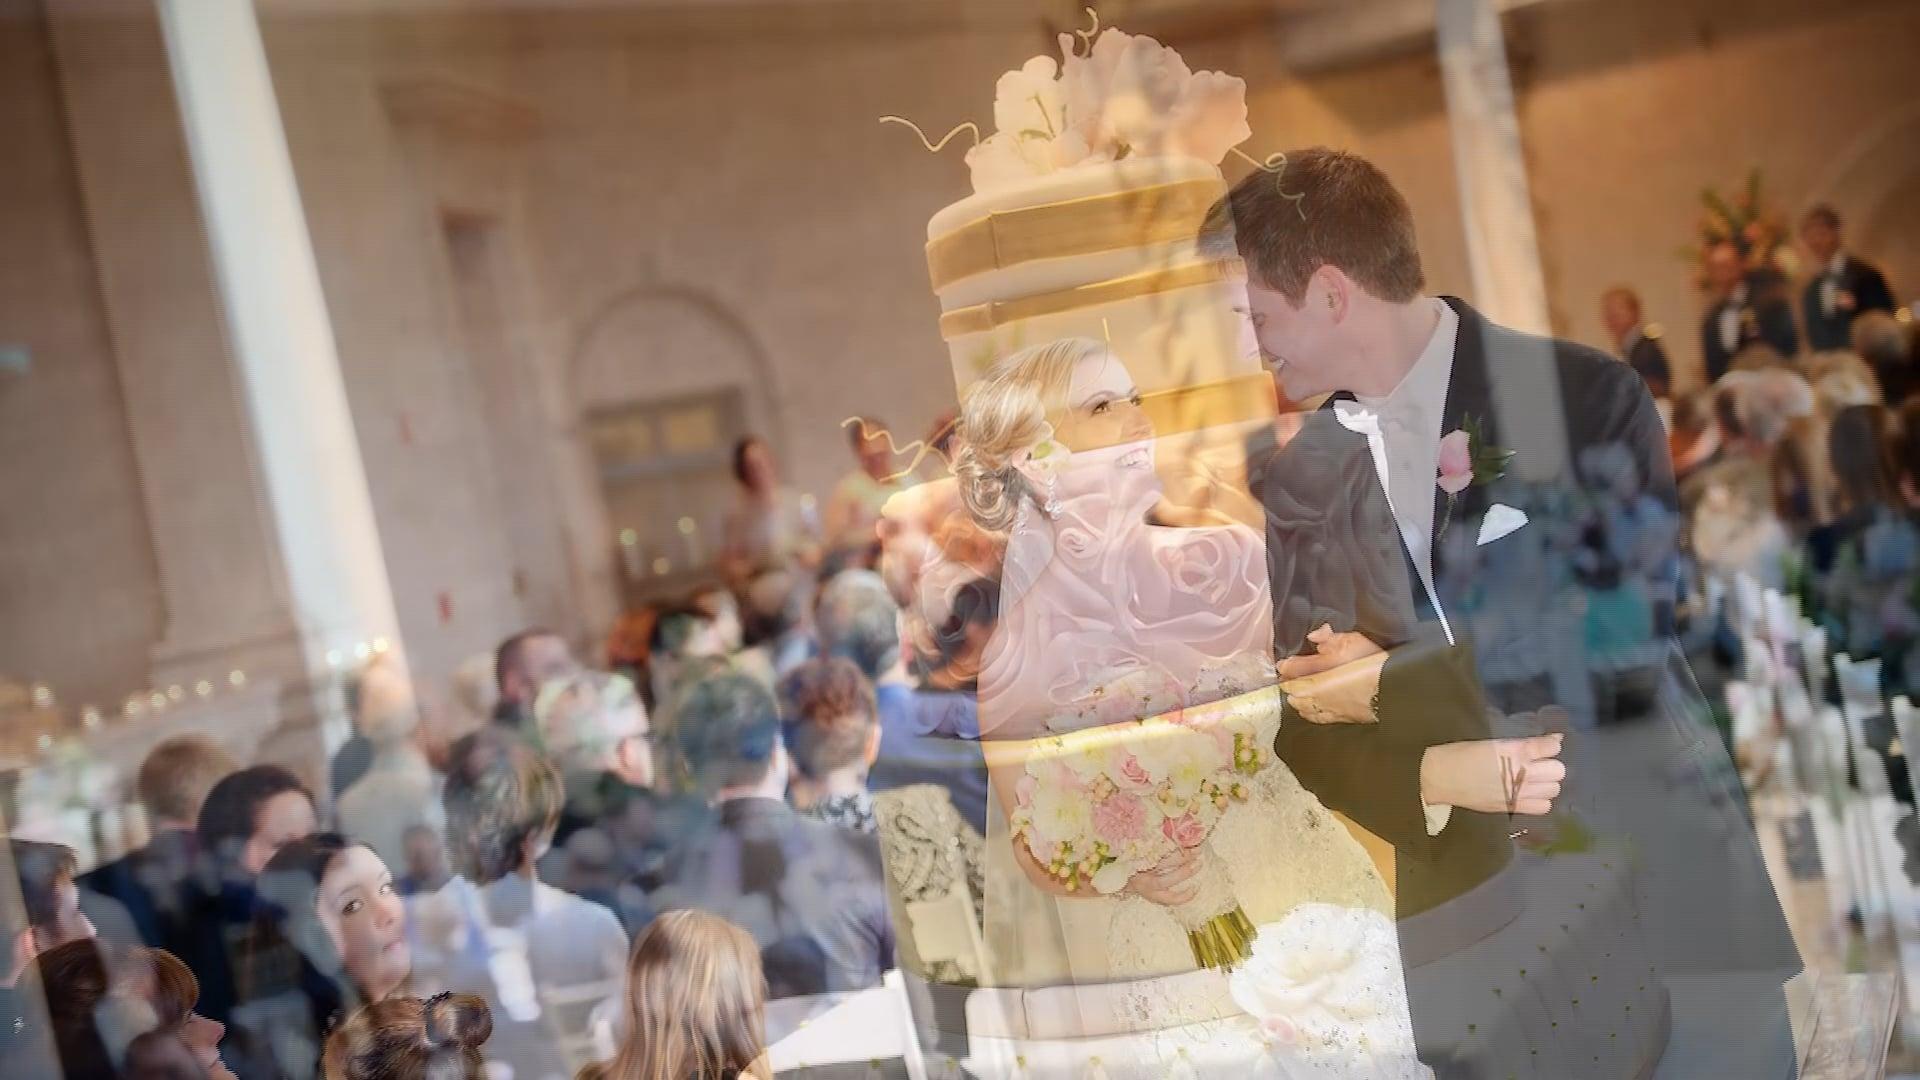 Art Institute Wedding and Ceremony